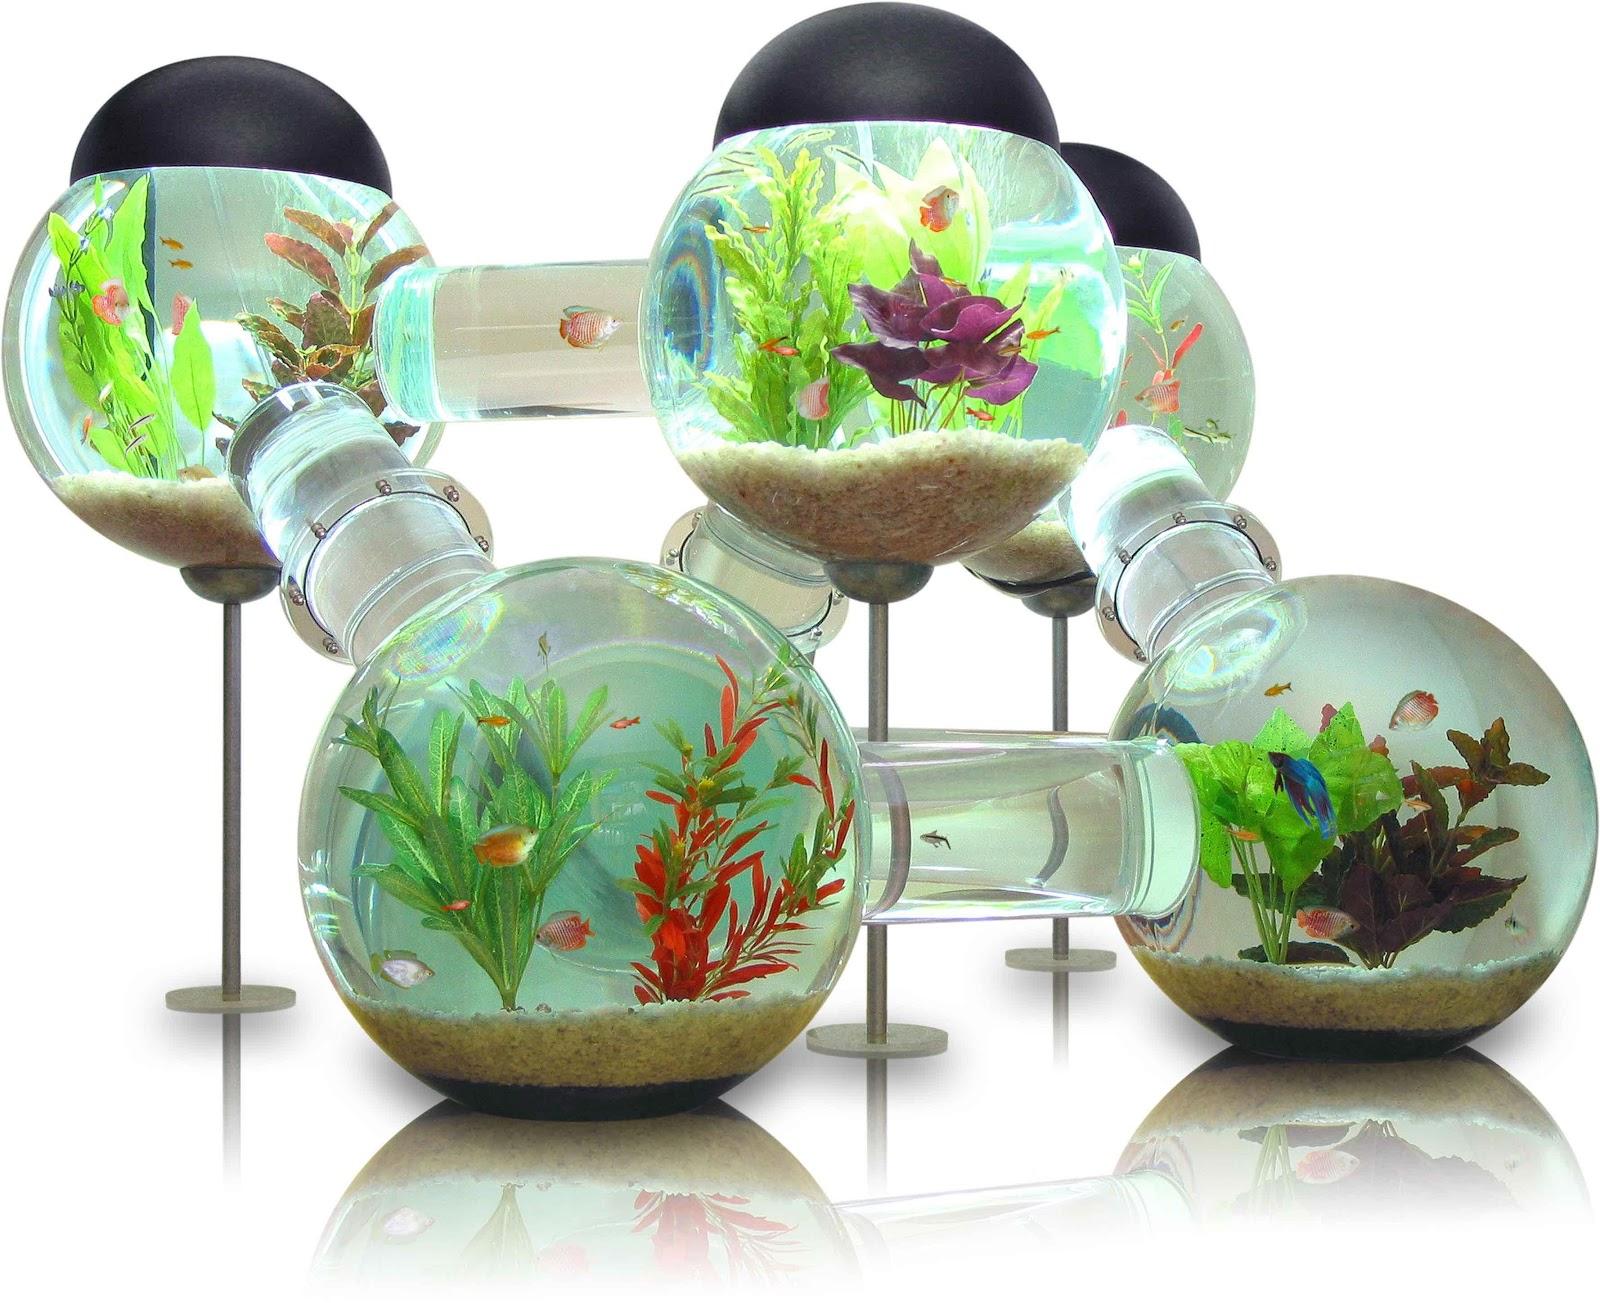 Franmagacine un acuario diferente para peces tropicales for Temperatura para peces tropicales acuario